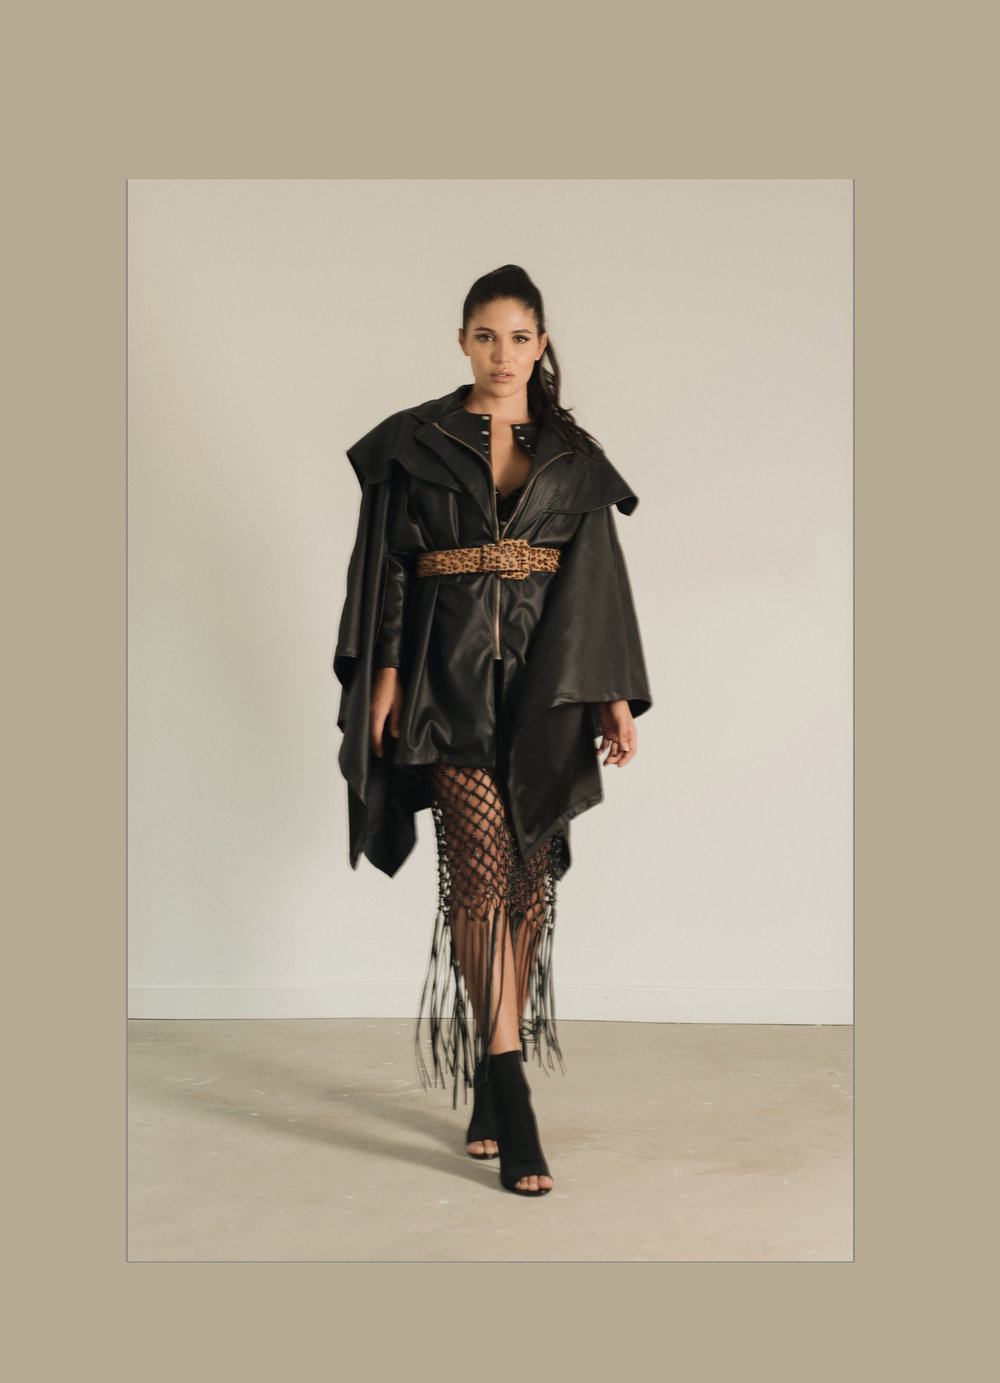 Cape: Miclott / Skirt. Andrea Landa at Casa Precis / Belt & Shoes. Zara